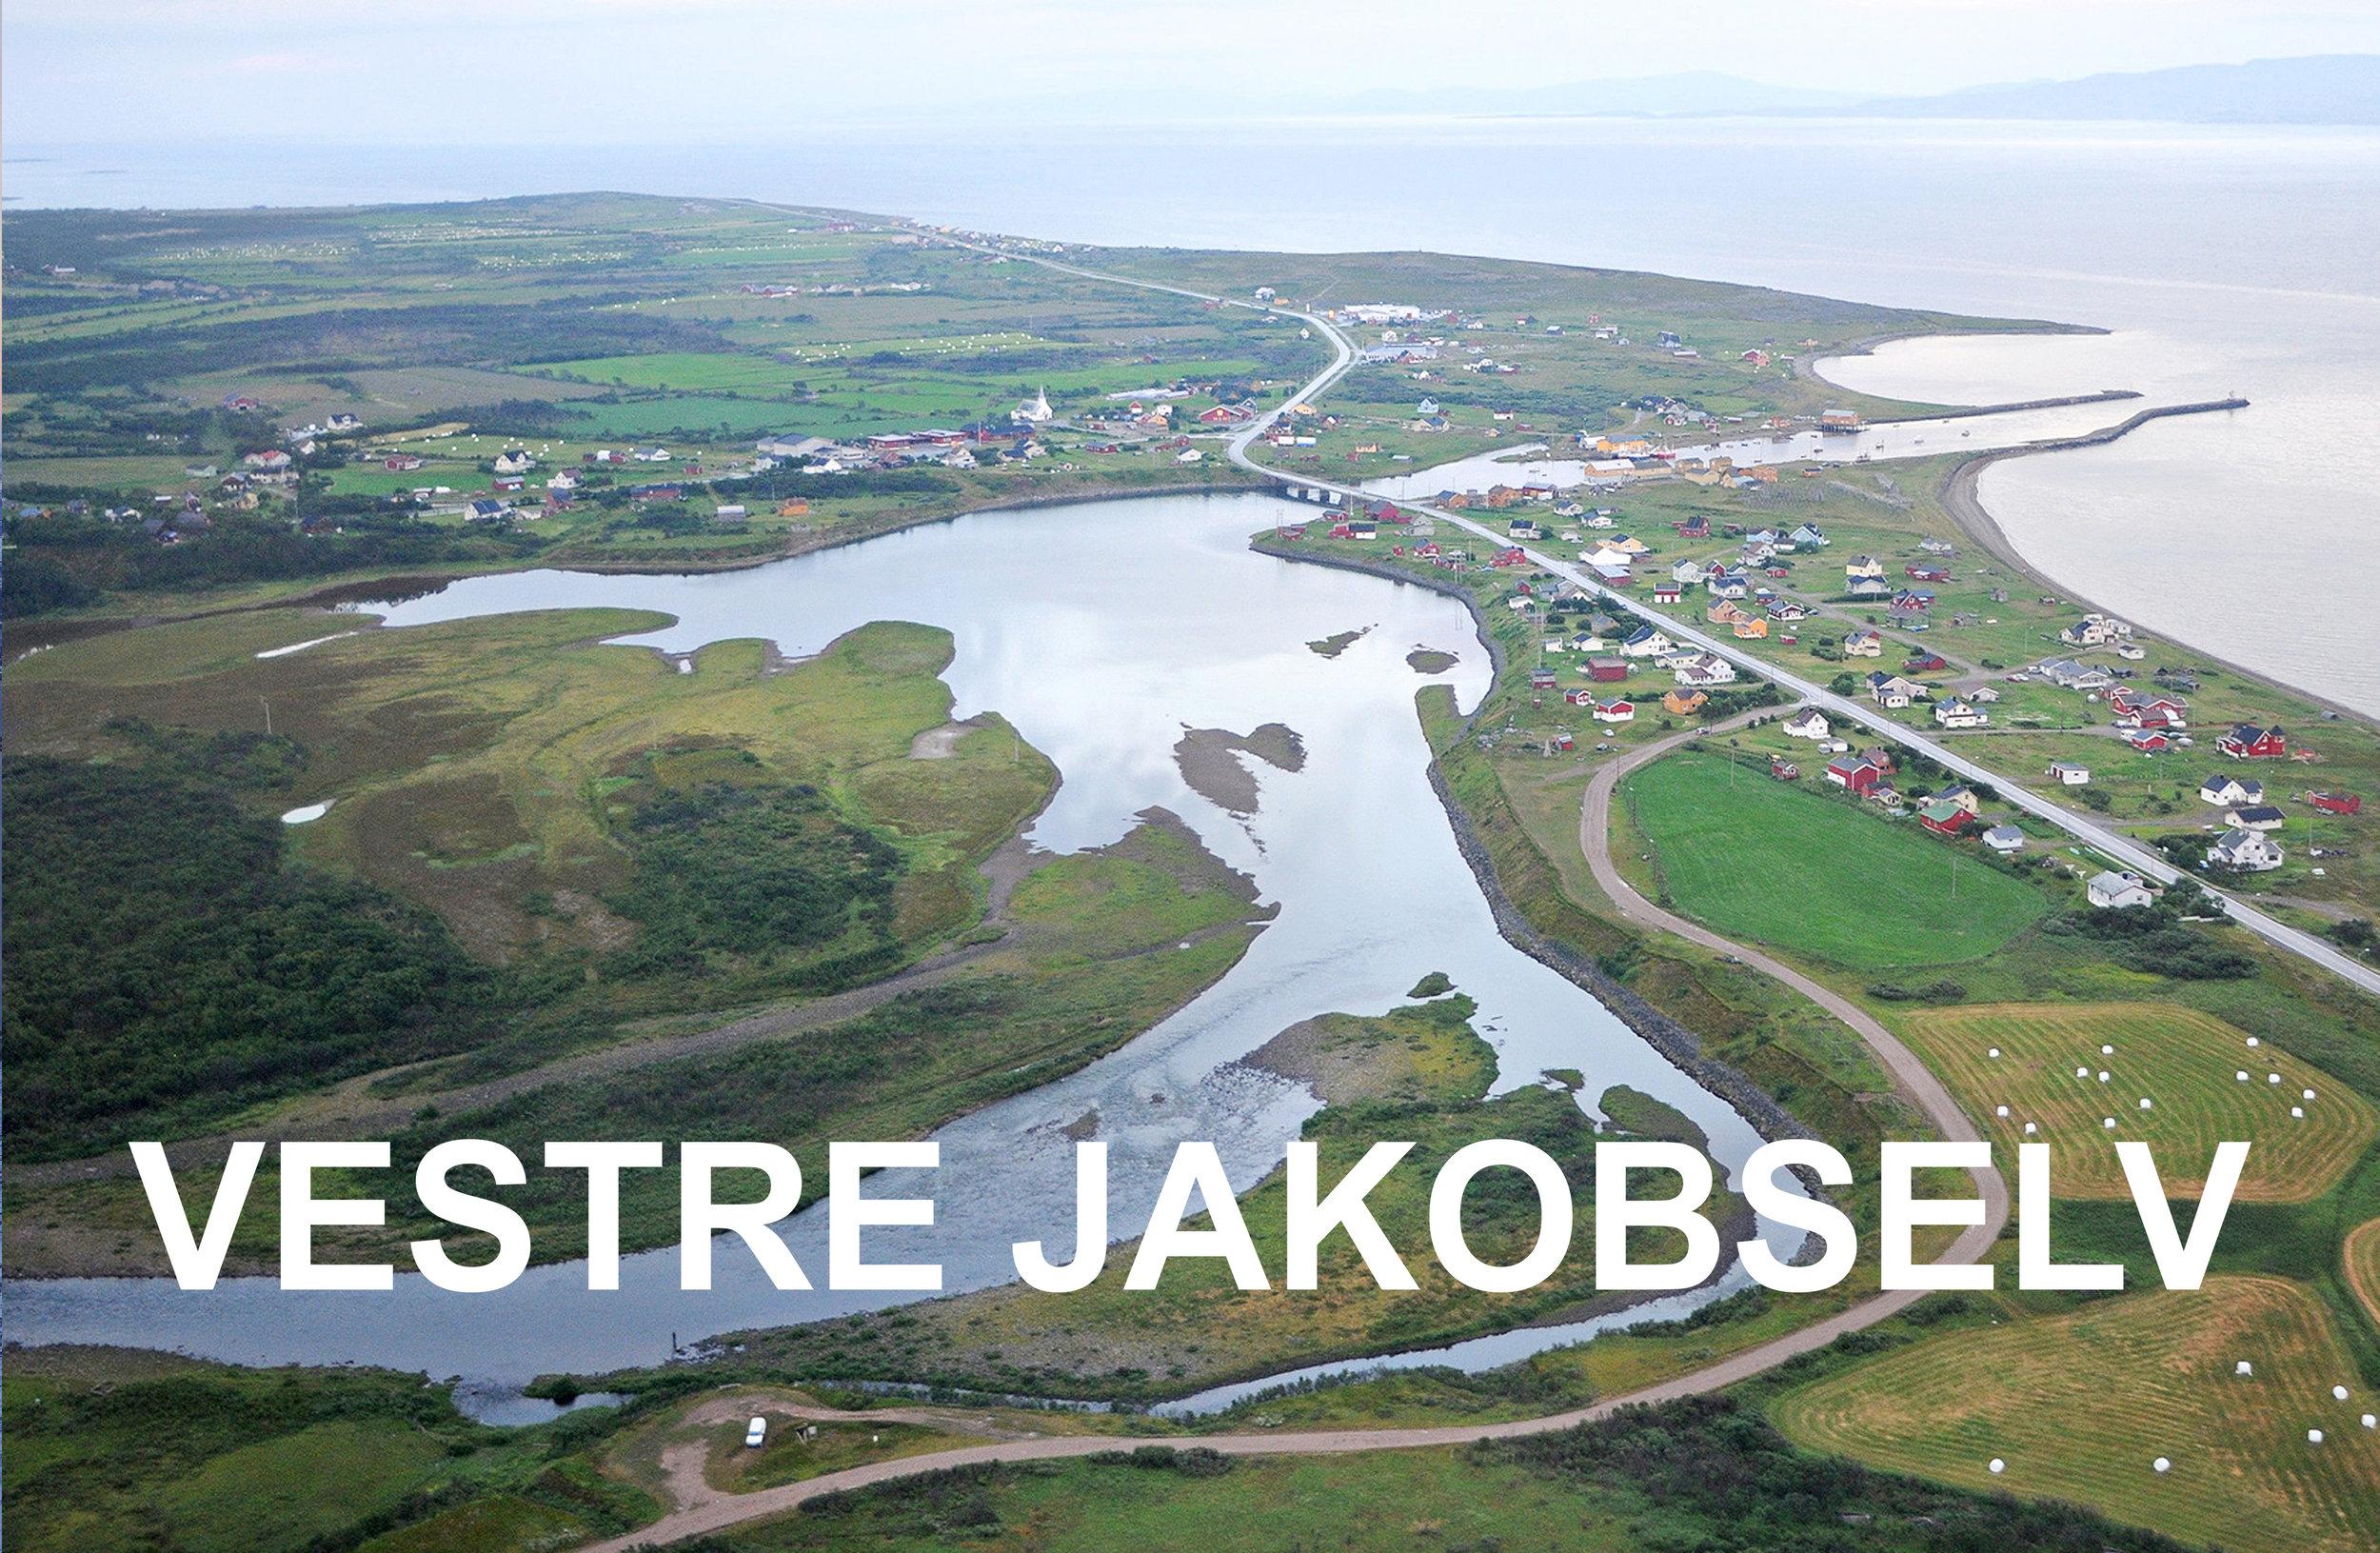 Vestre_Jakobselv_Varanger_Copyright_Biotope